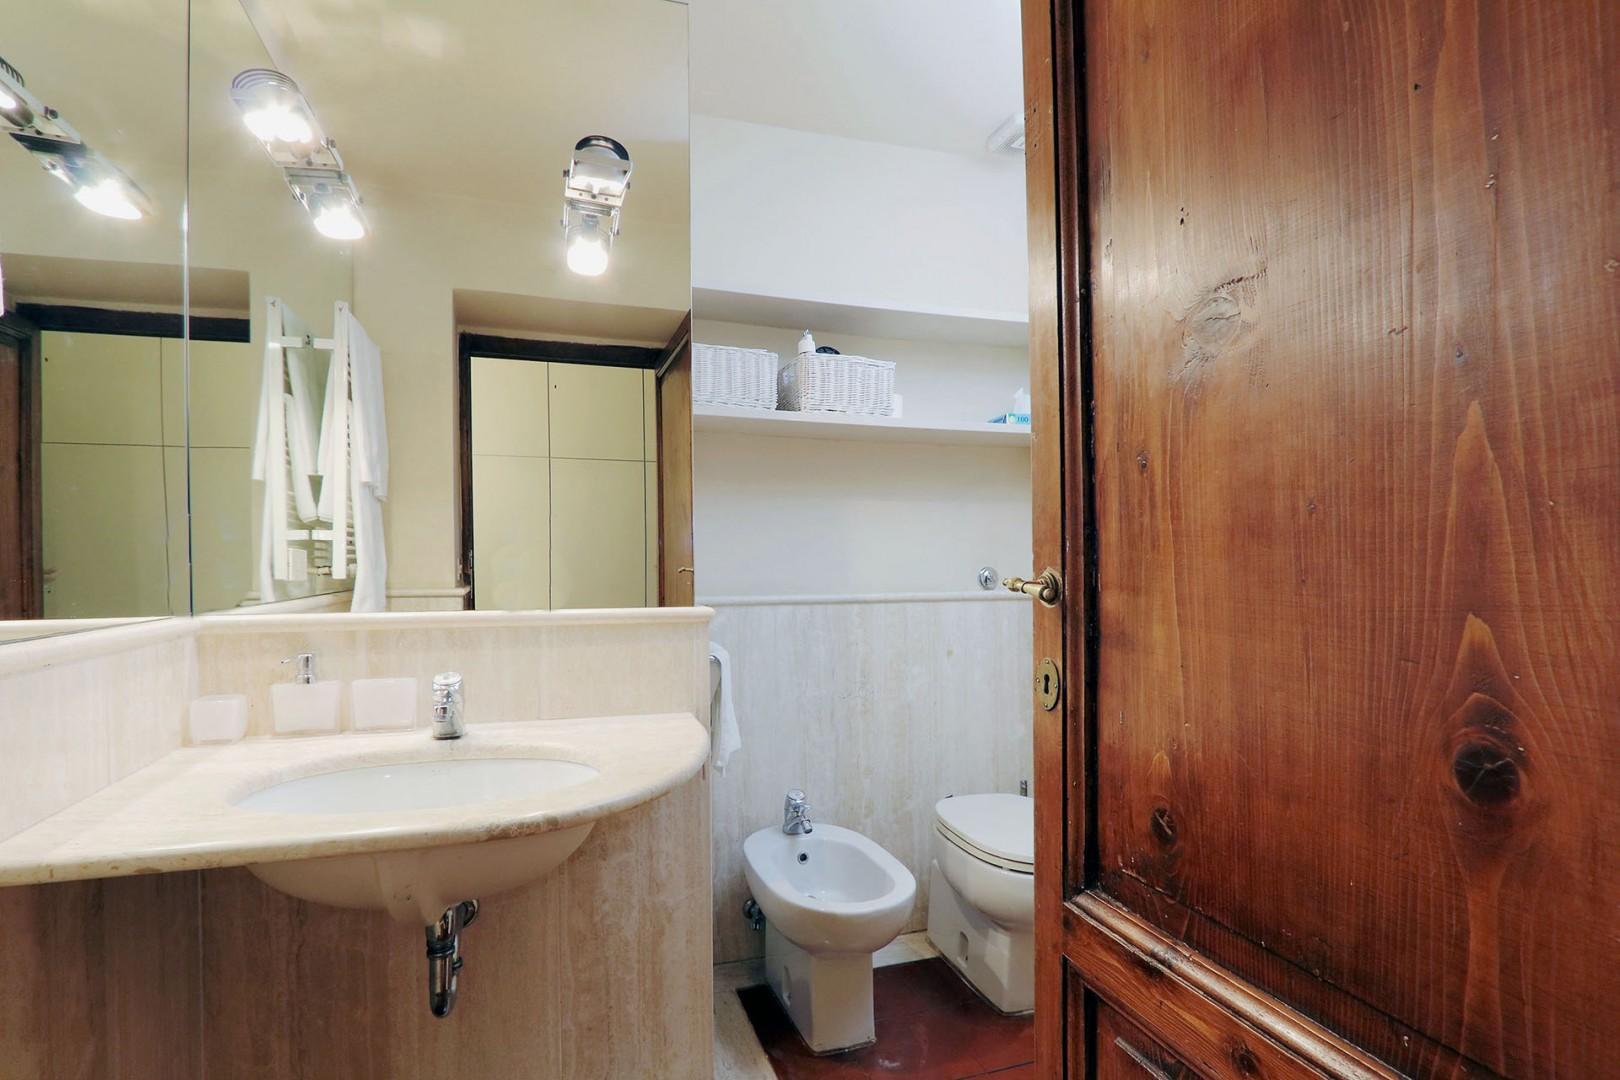 Off the hallway is bathroom 2. Marble walls, sink, toilet, bidet and shower.